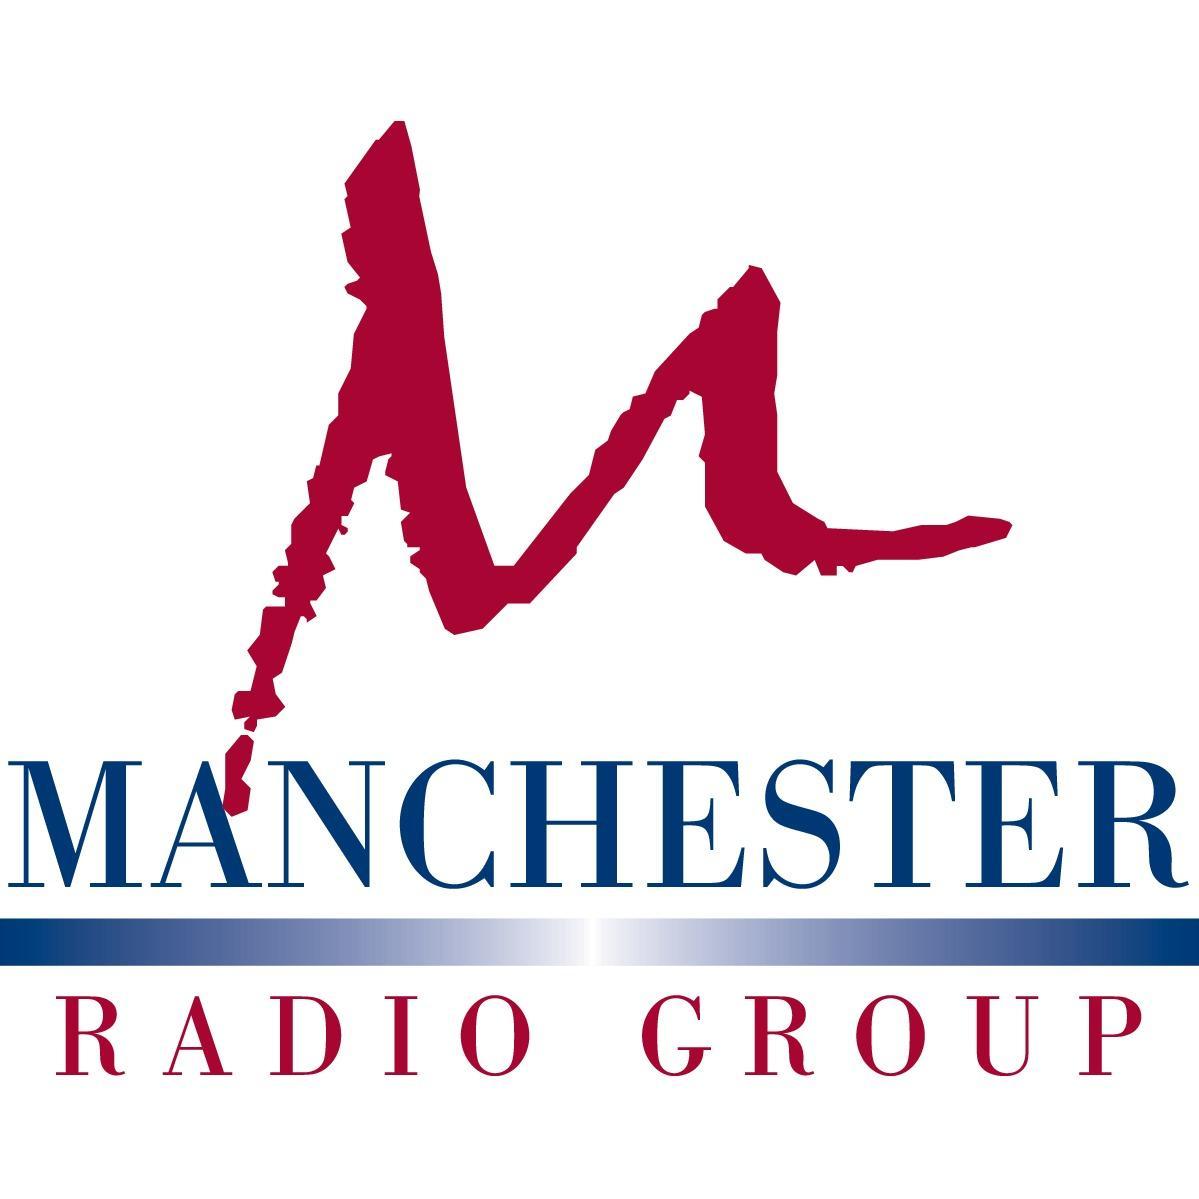 Manchester Radio Group